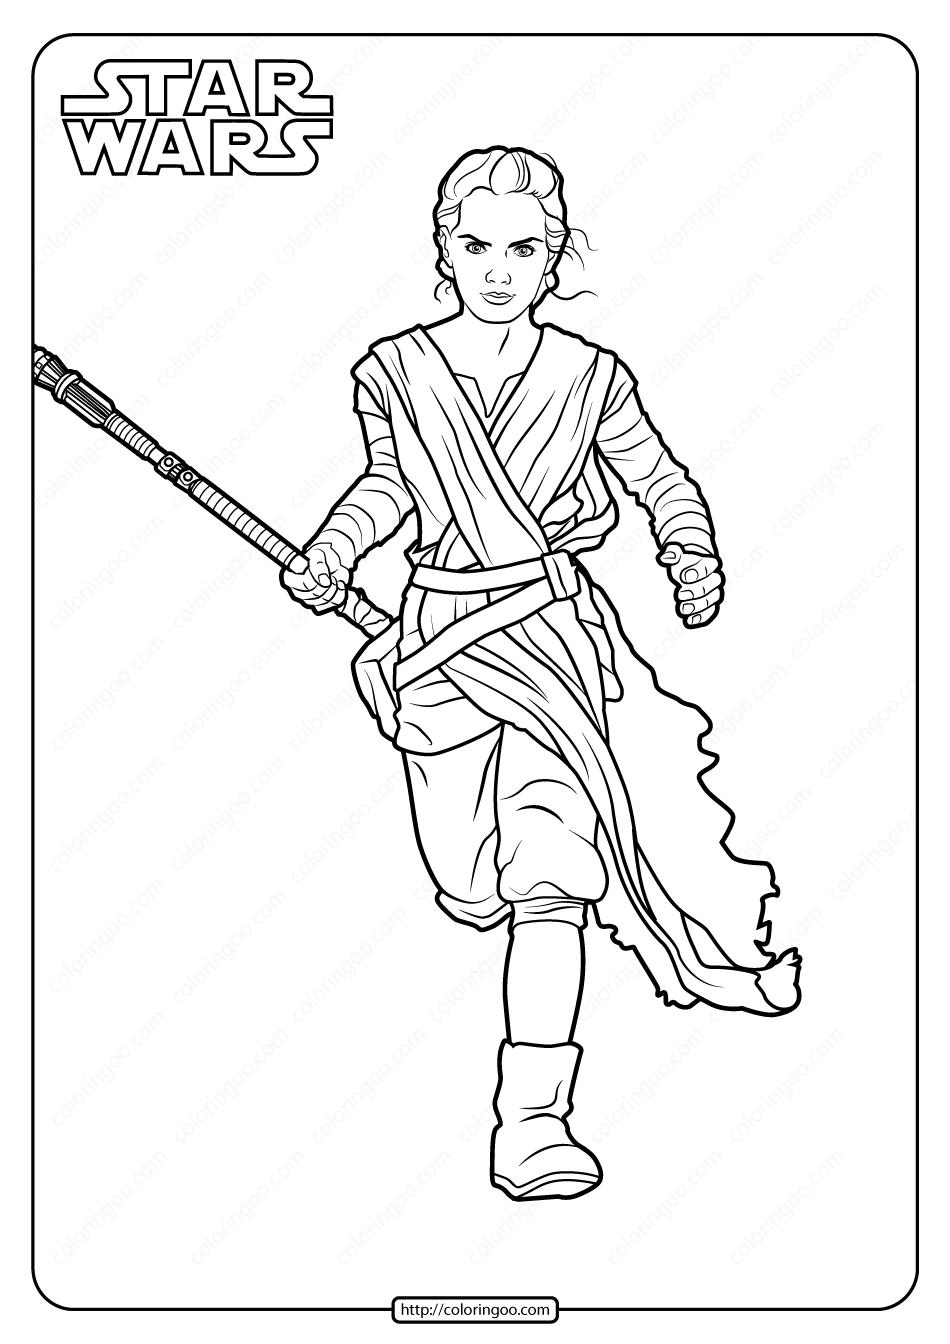 Star Wars Rey Printable Coloring Pages Book Rey Star Wars Printable Coloring Pages Star Wars Colors